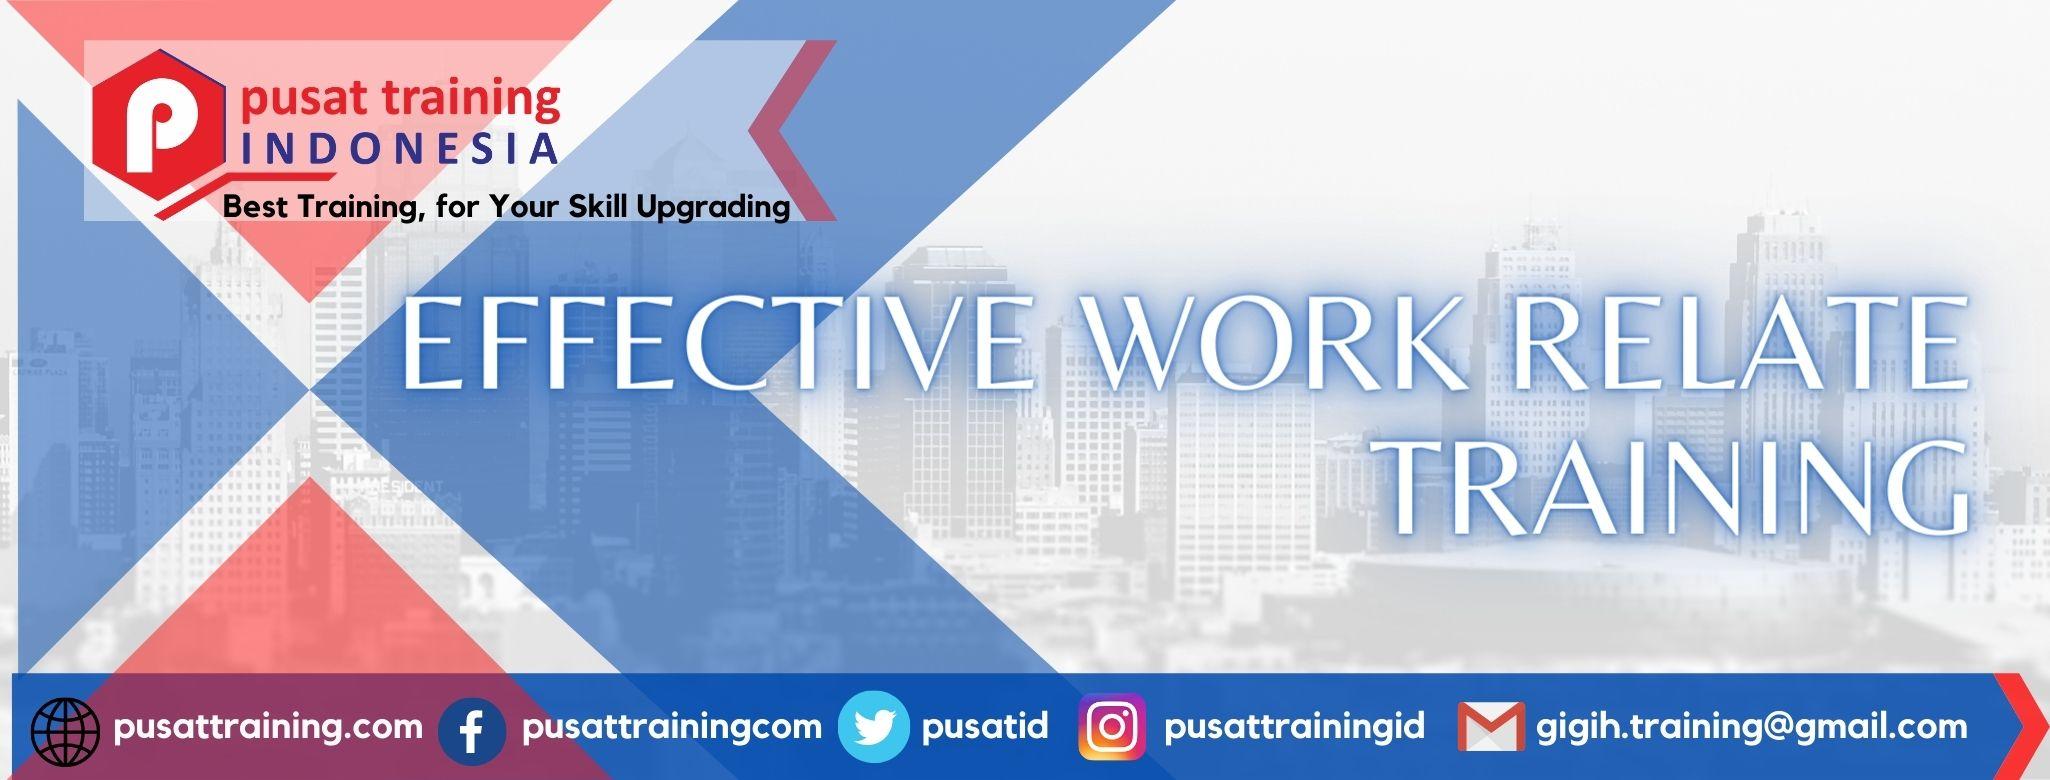 EFFECTIVE WORK RELATE TRAINING